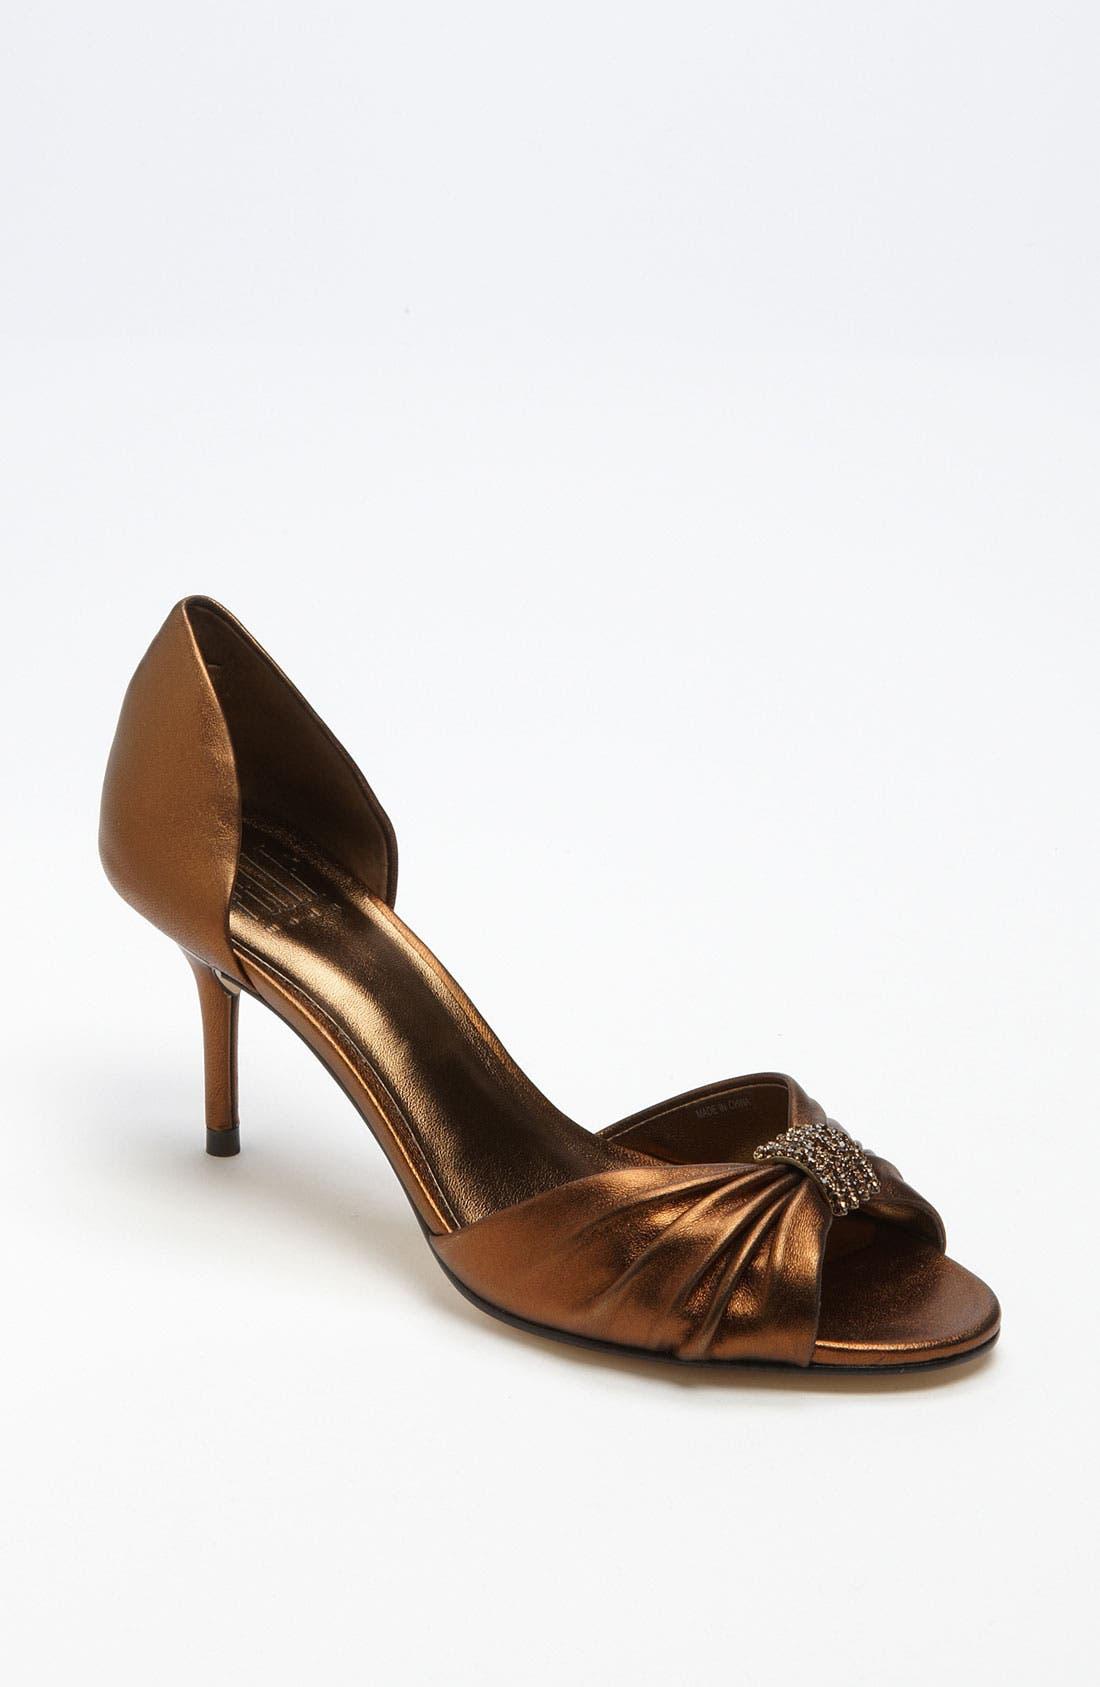 Main Image - Pelle Moda 'Iris' Sandal